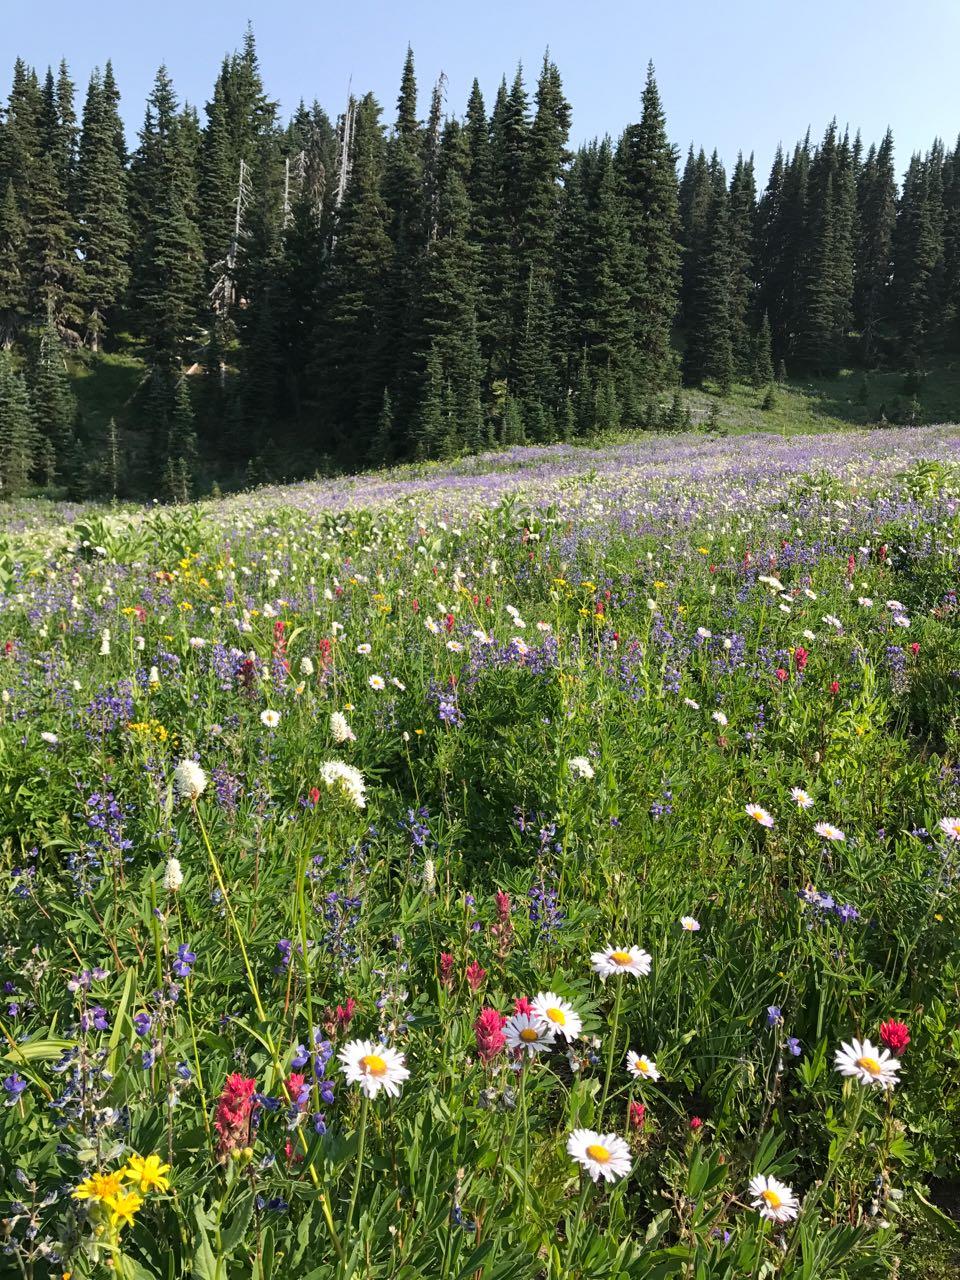 Mt. Rainier flower field